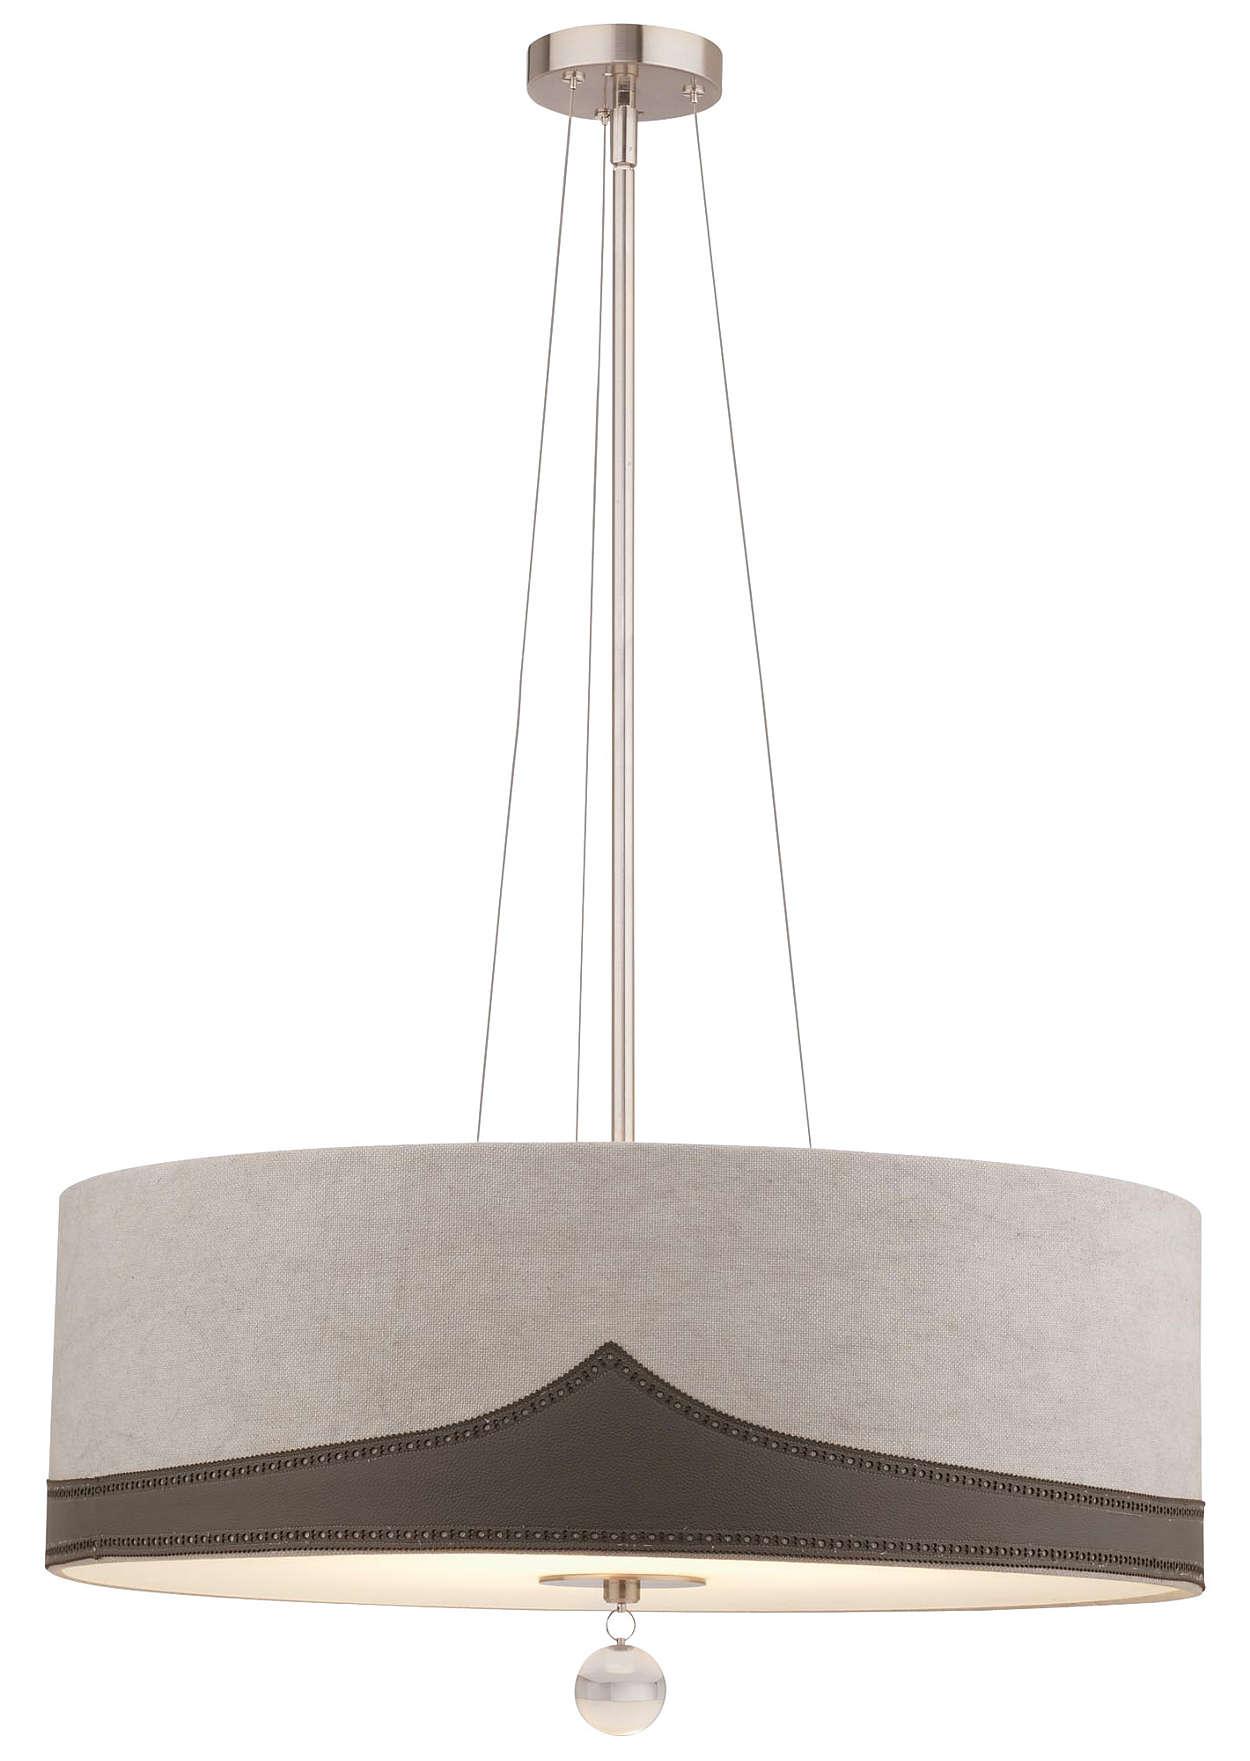 Wing Tip 3-light Pendant in Satin Nickel finish